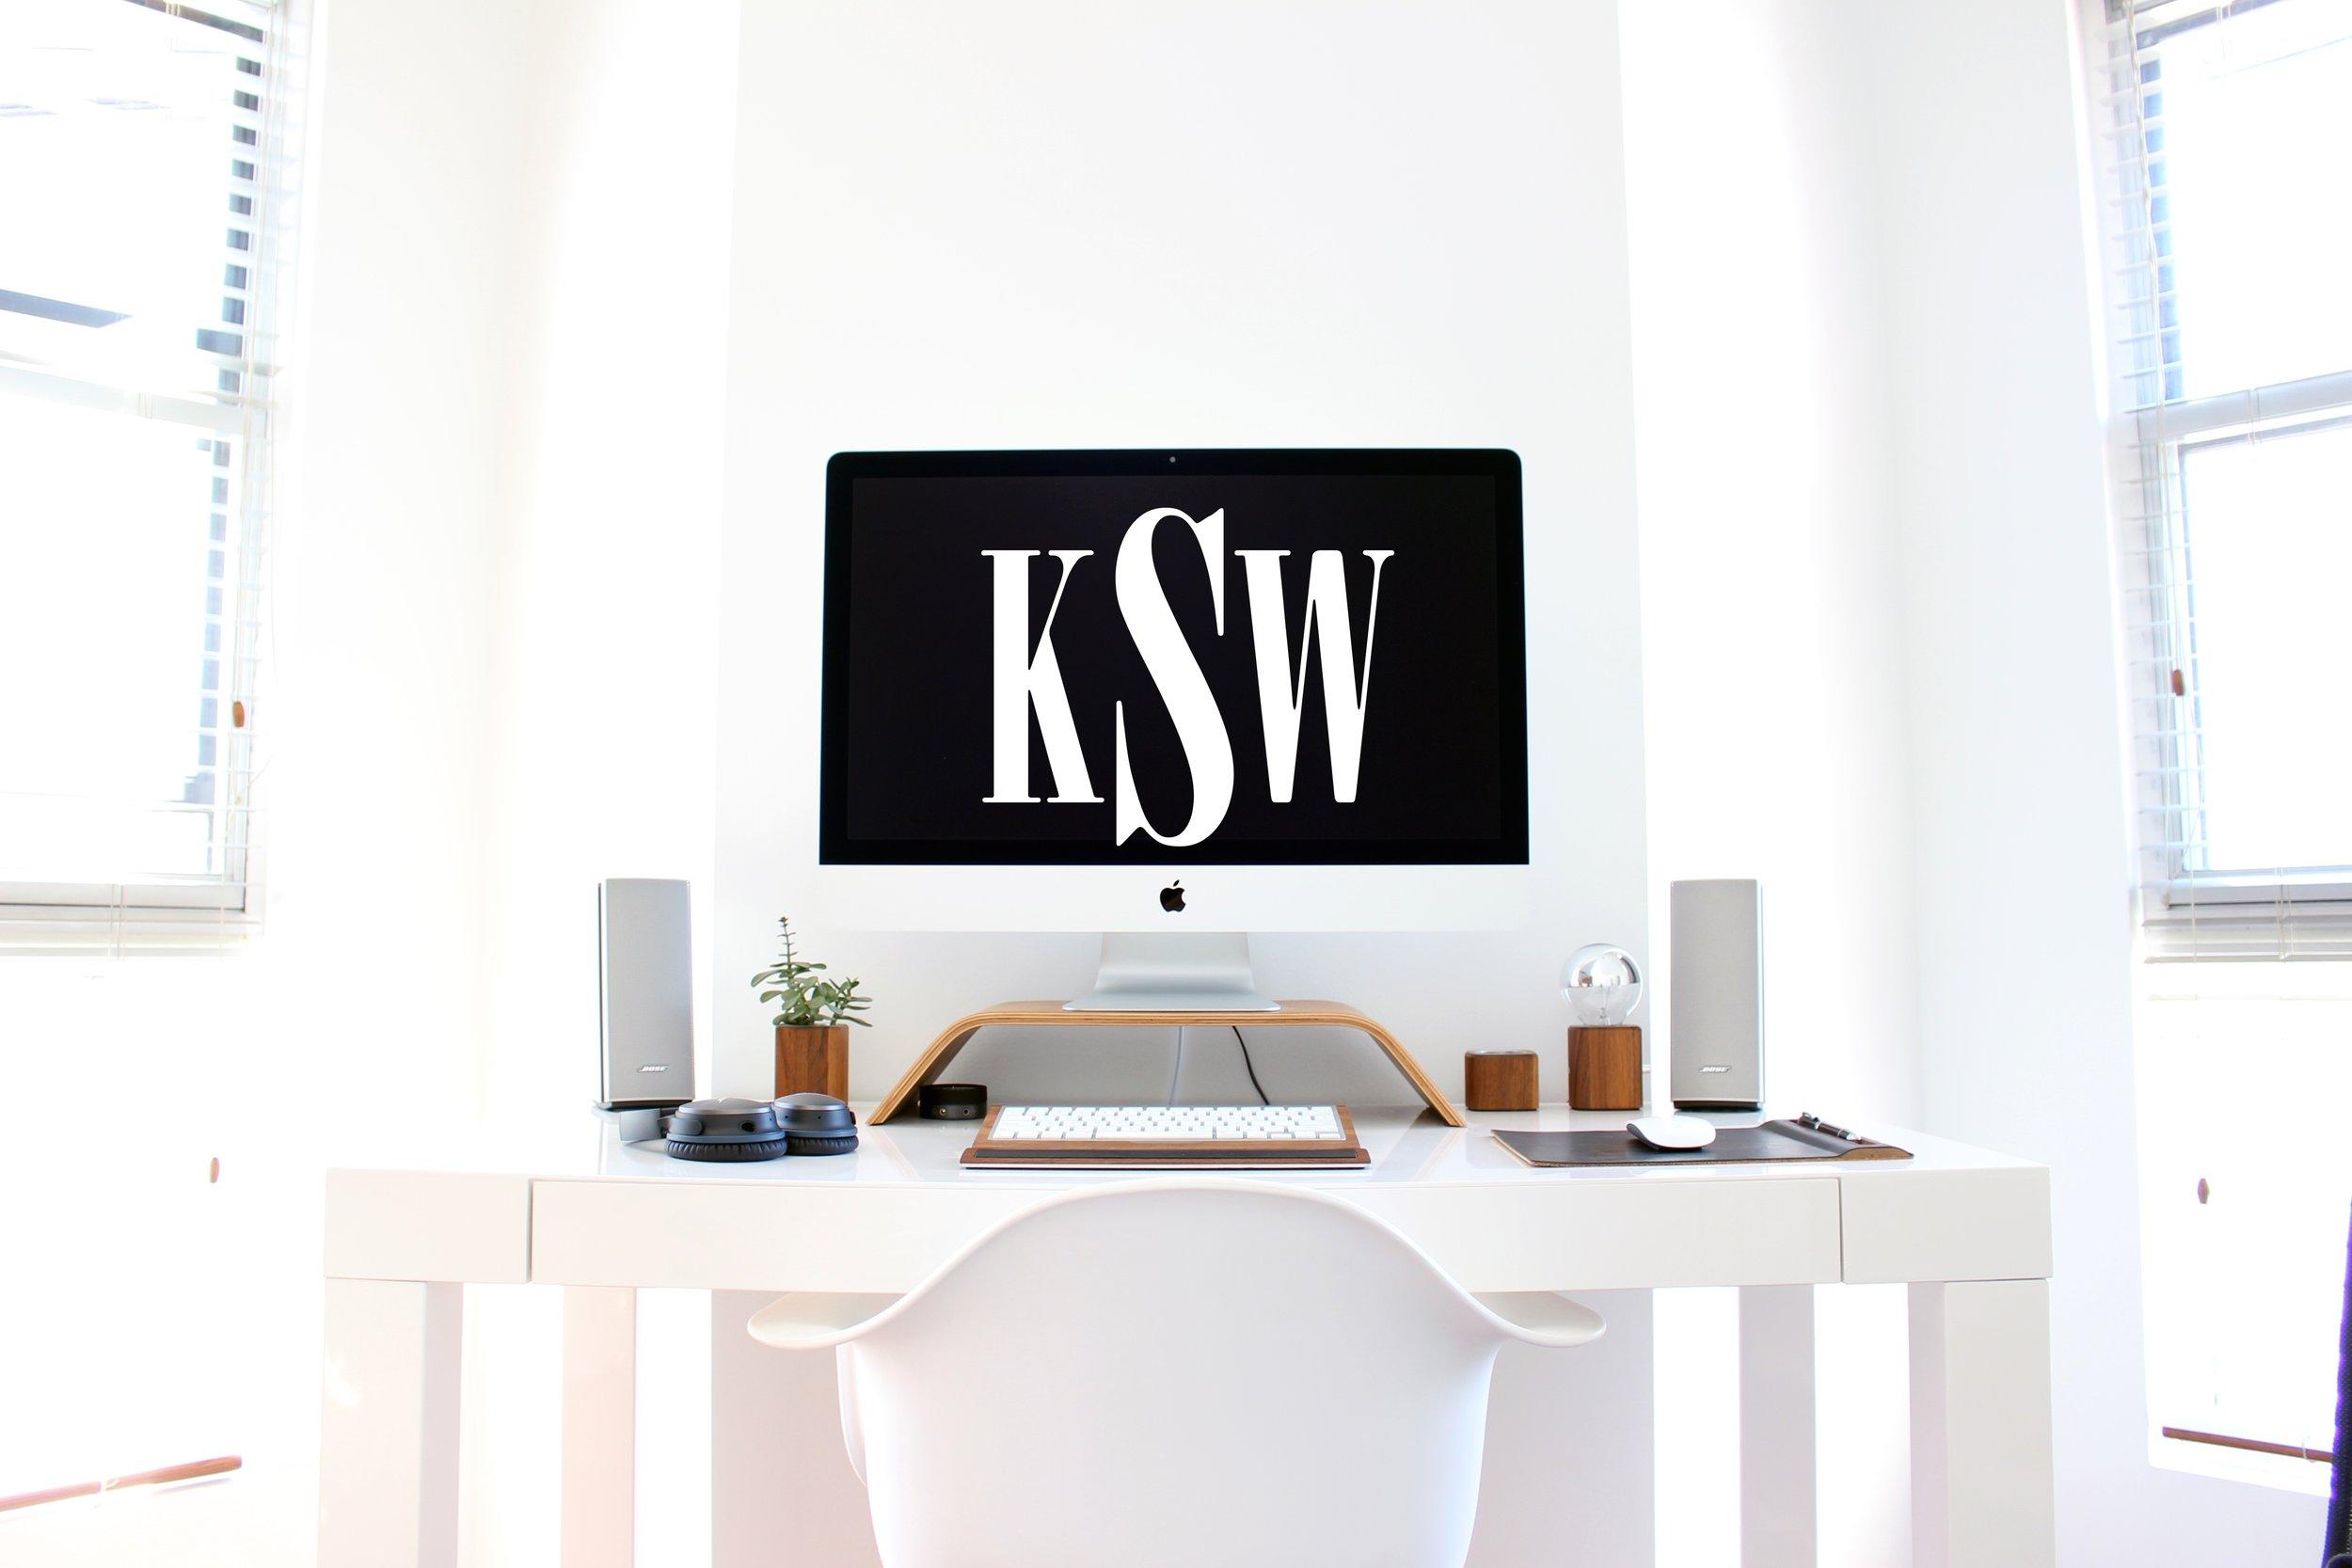 KlaySWilliams.com